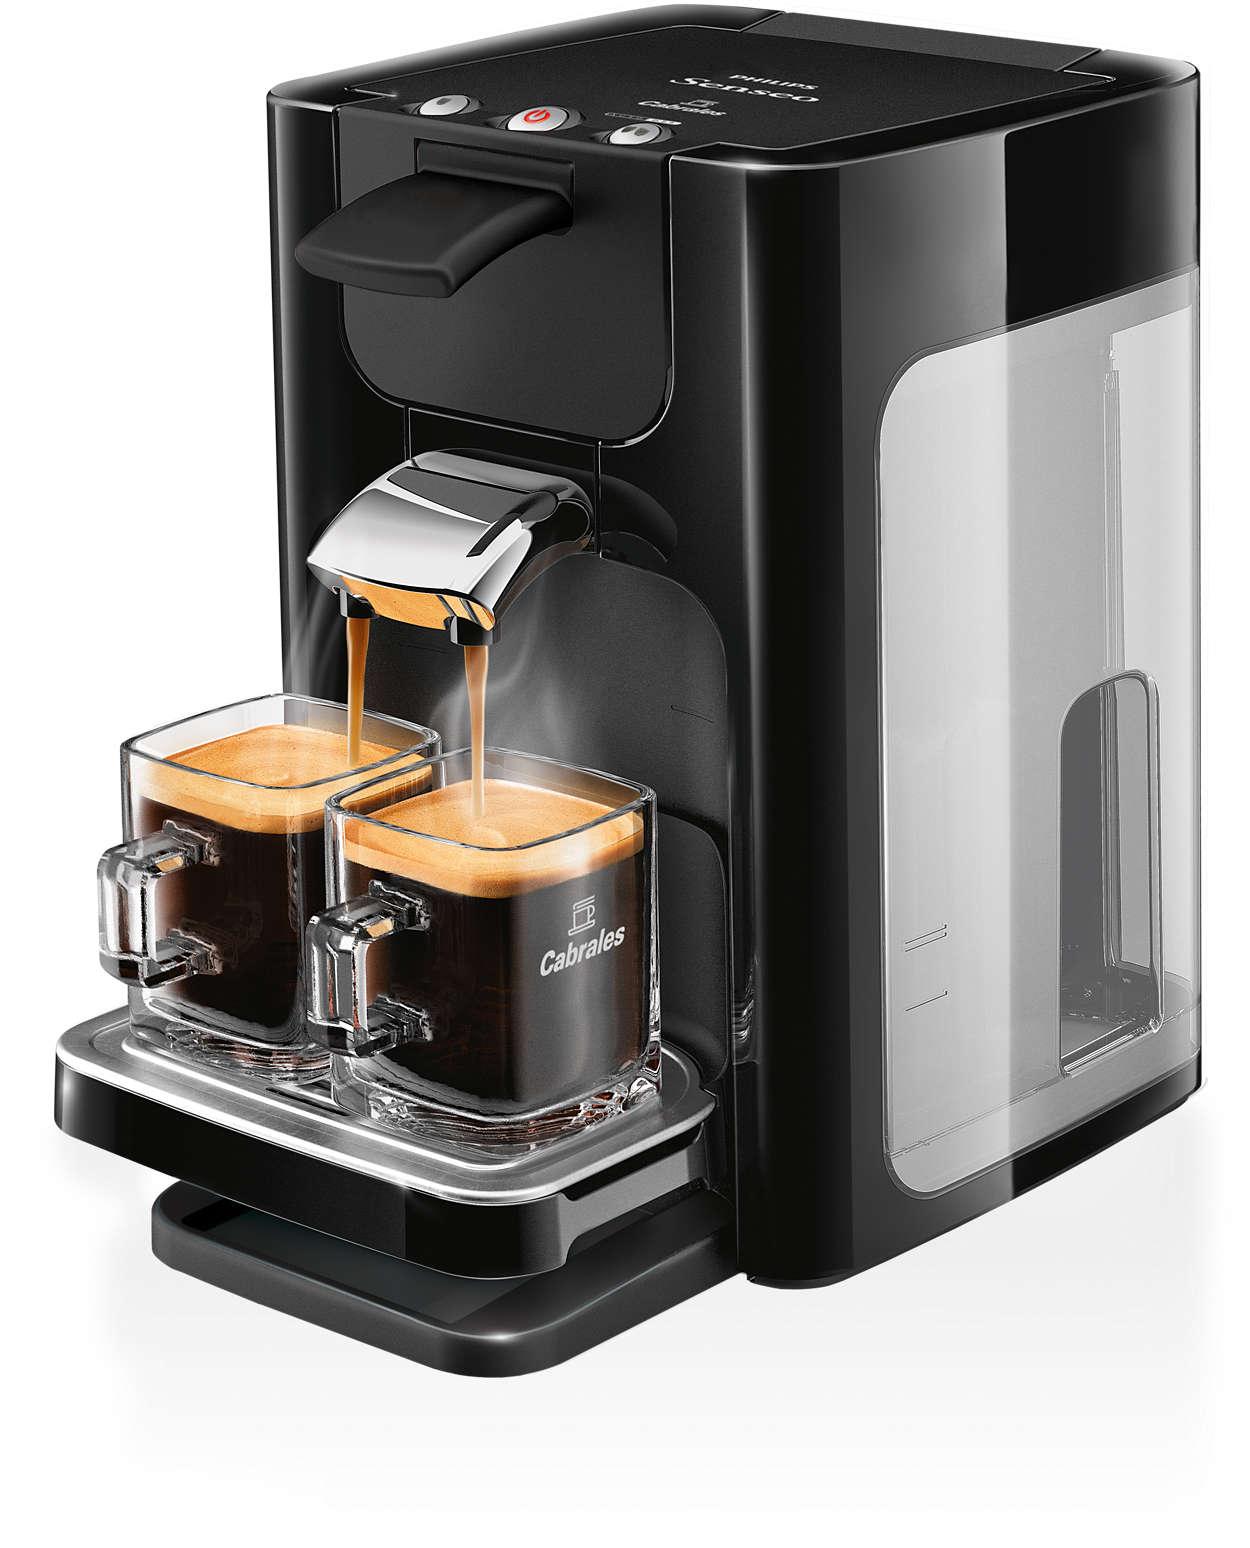 Café delicioso a un toque con un diseño moderno